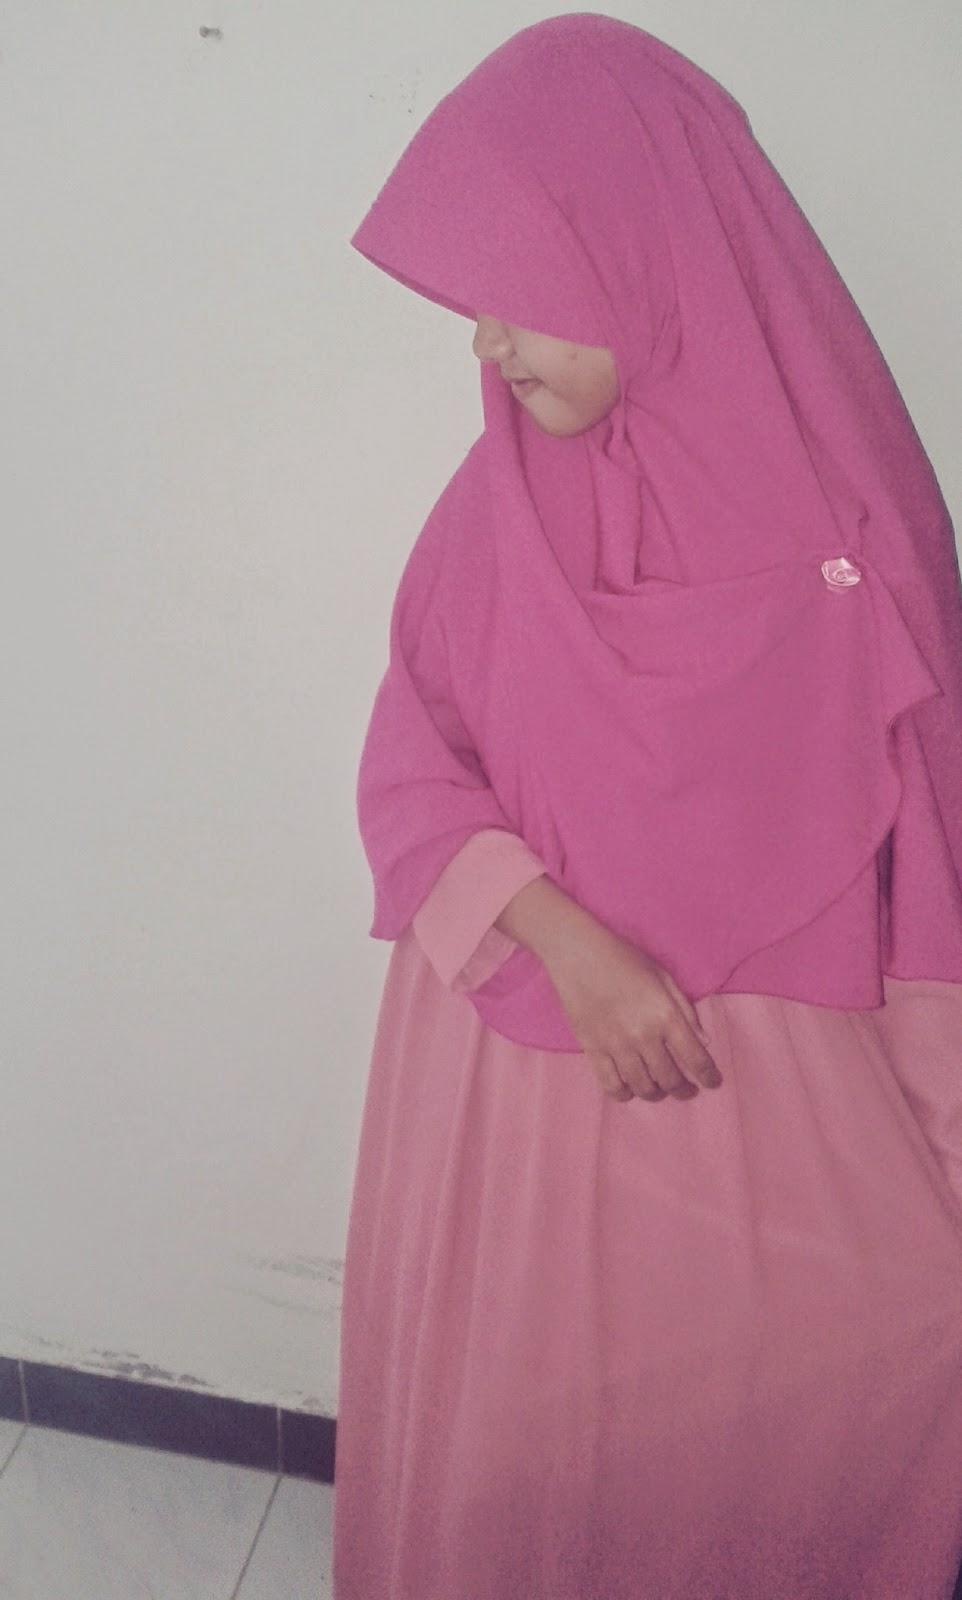 produk hijab dwibcc dwi lestari